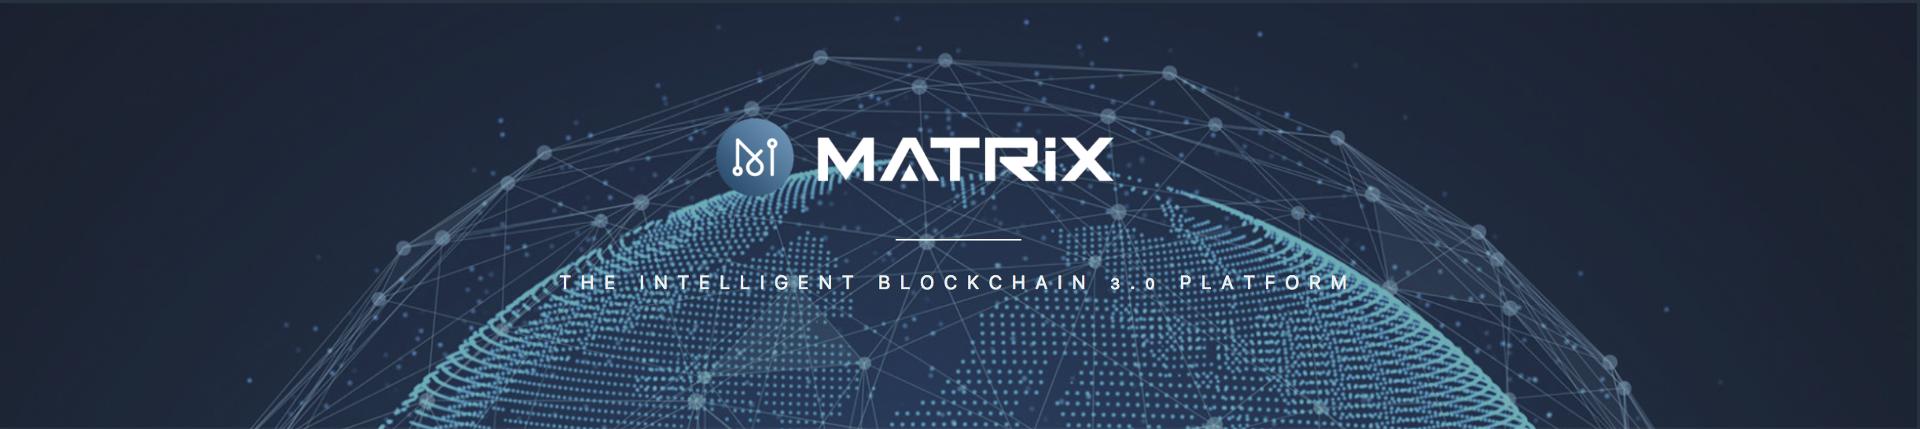 Blockckchain 3.0 MAN